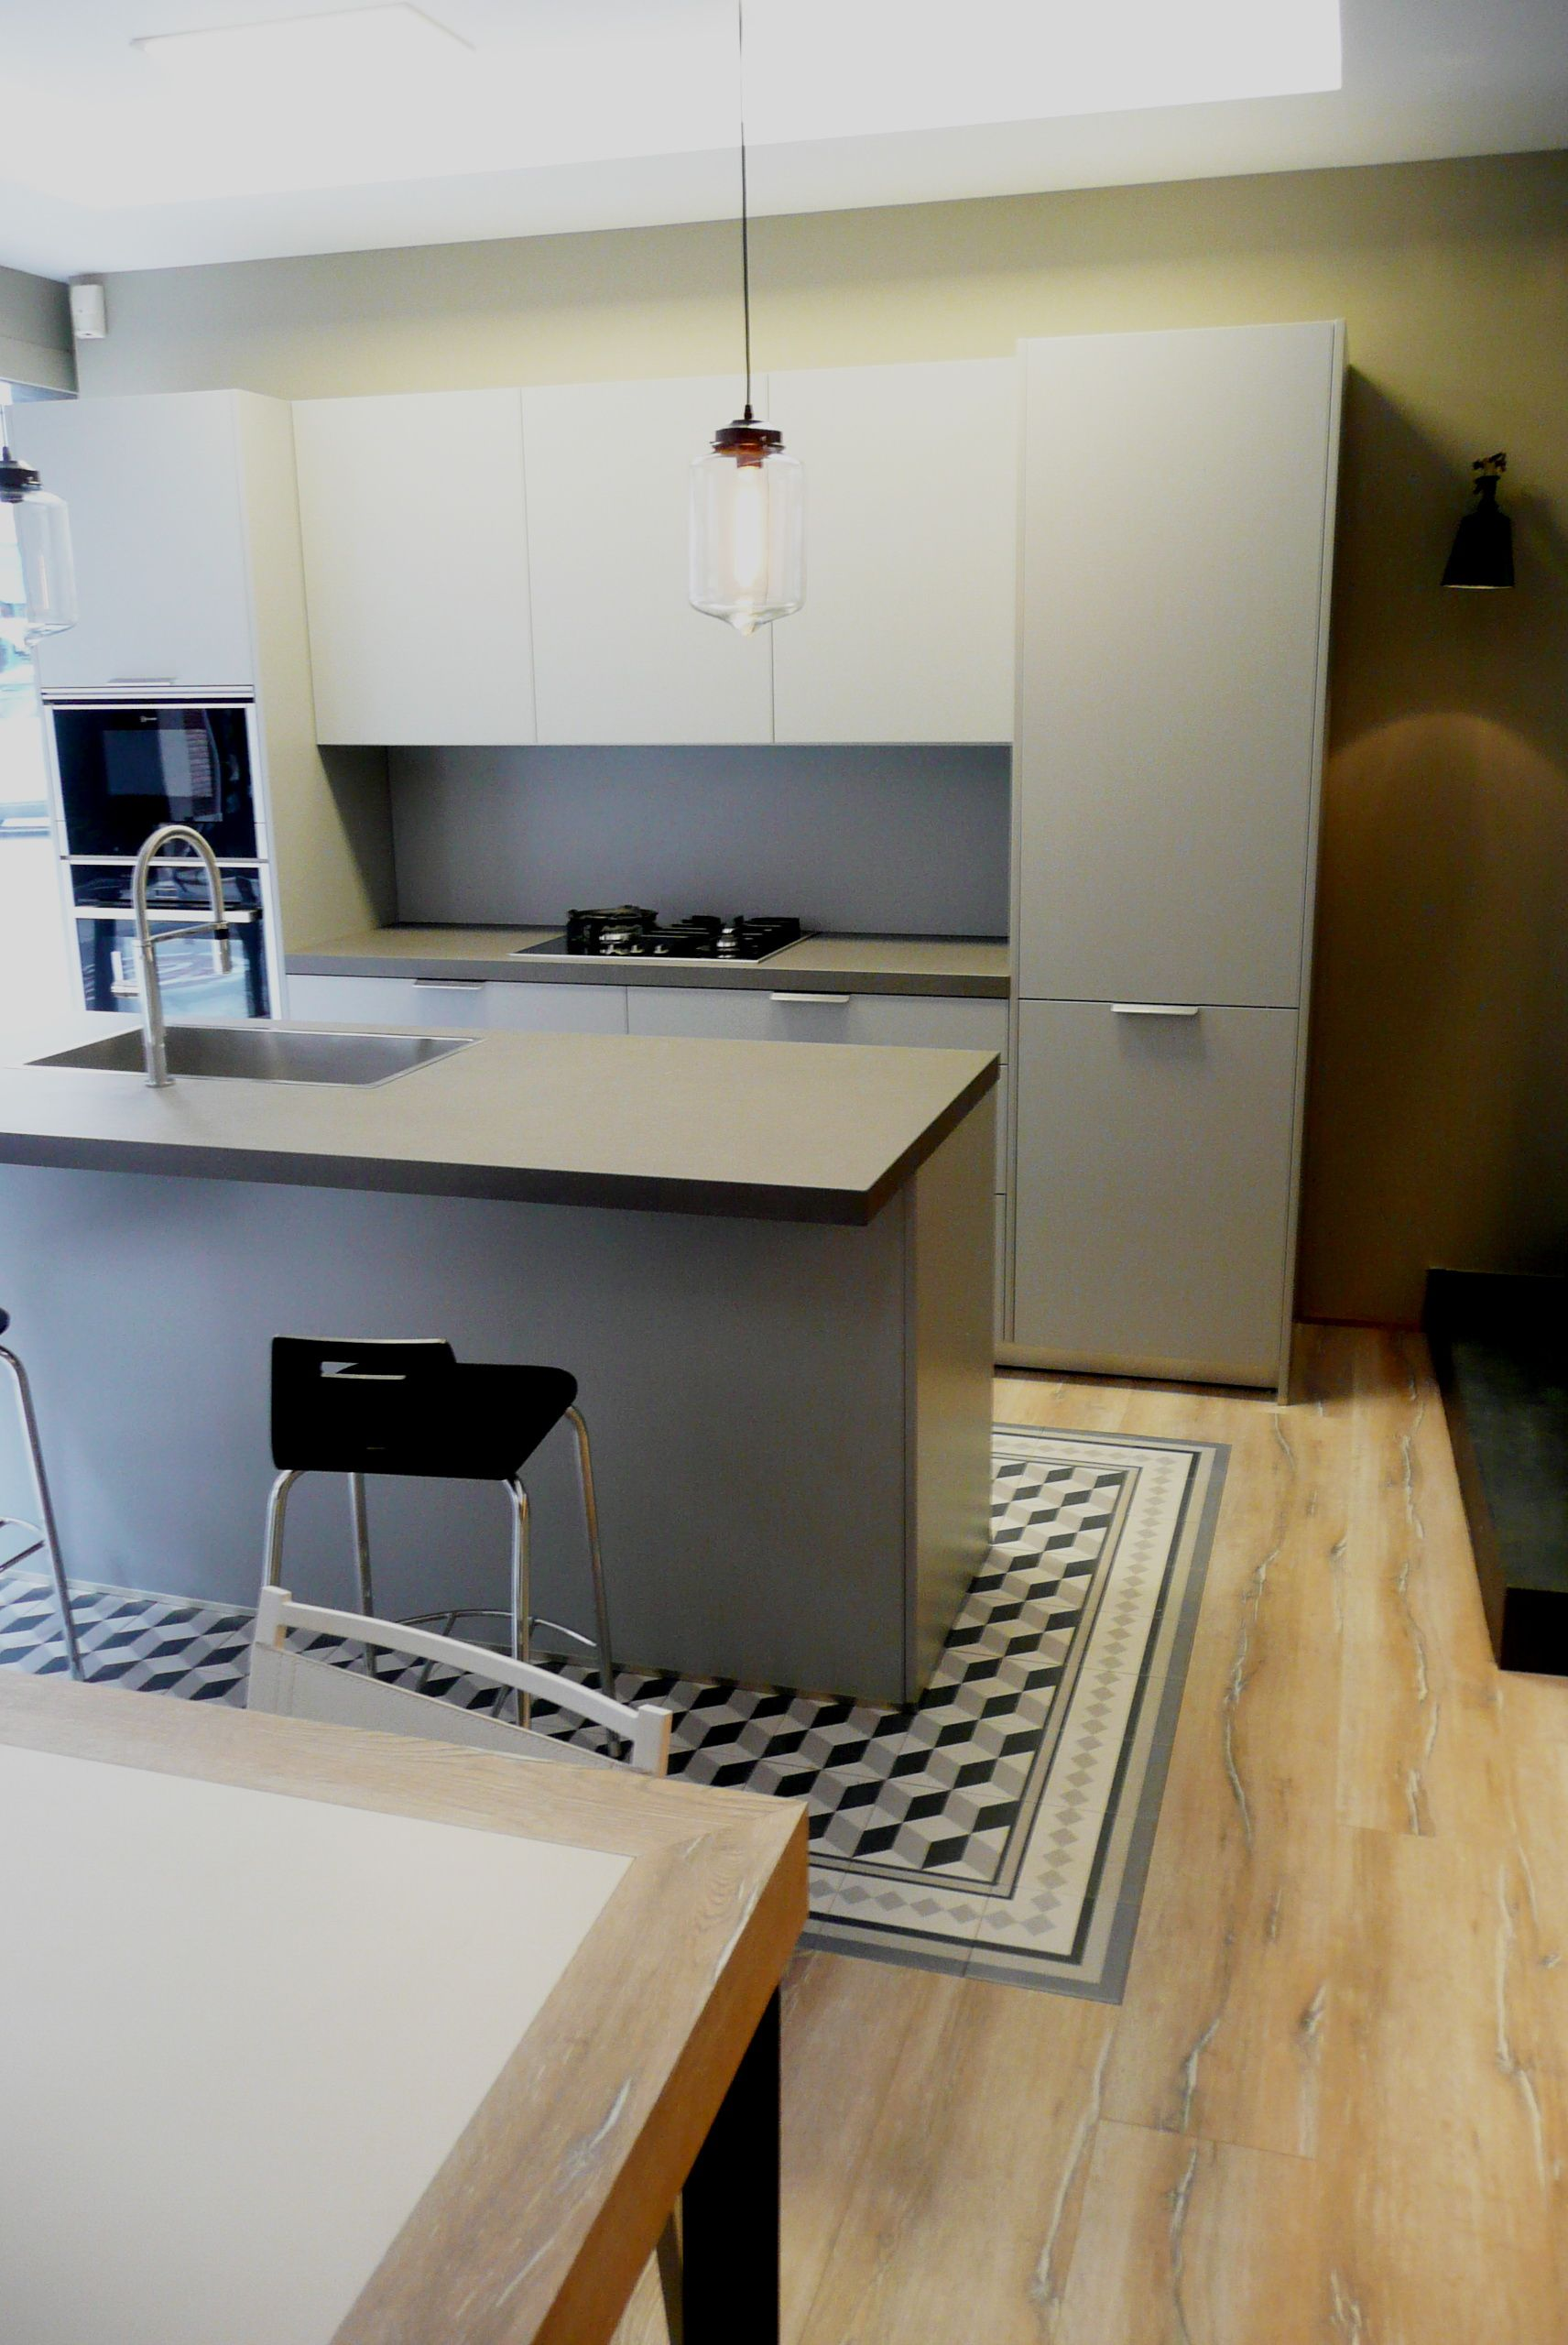 Santos cocina en color gris piedra modelo ariane2 con for Modelos de cocinas